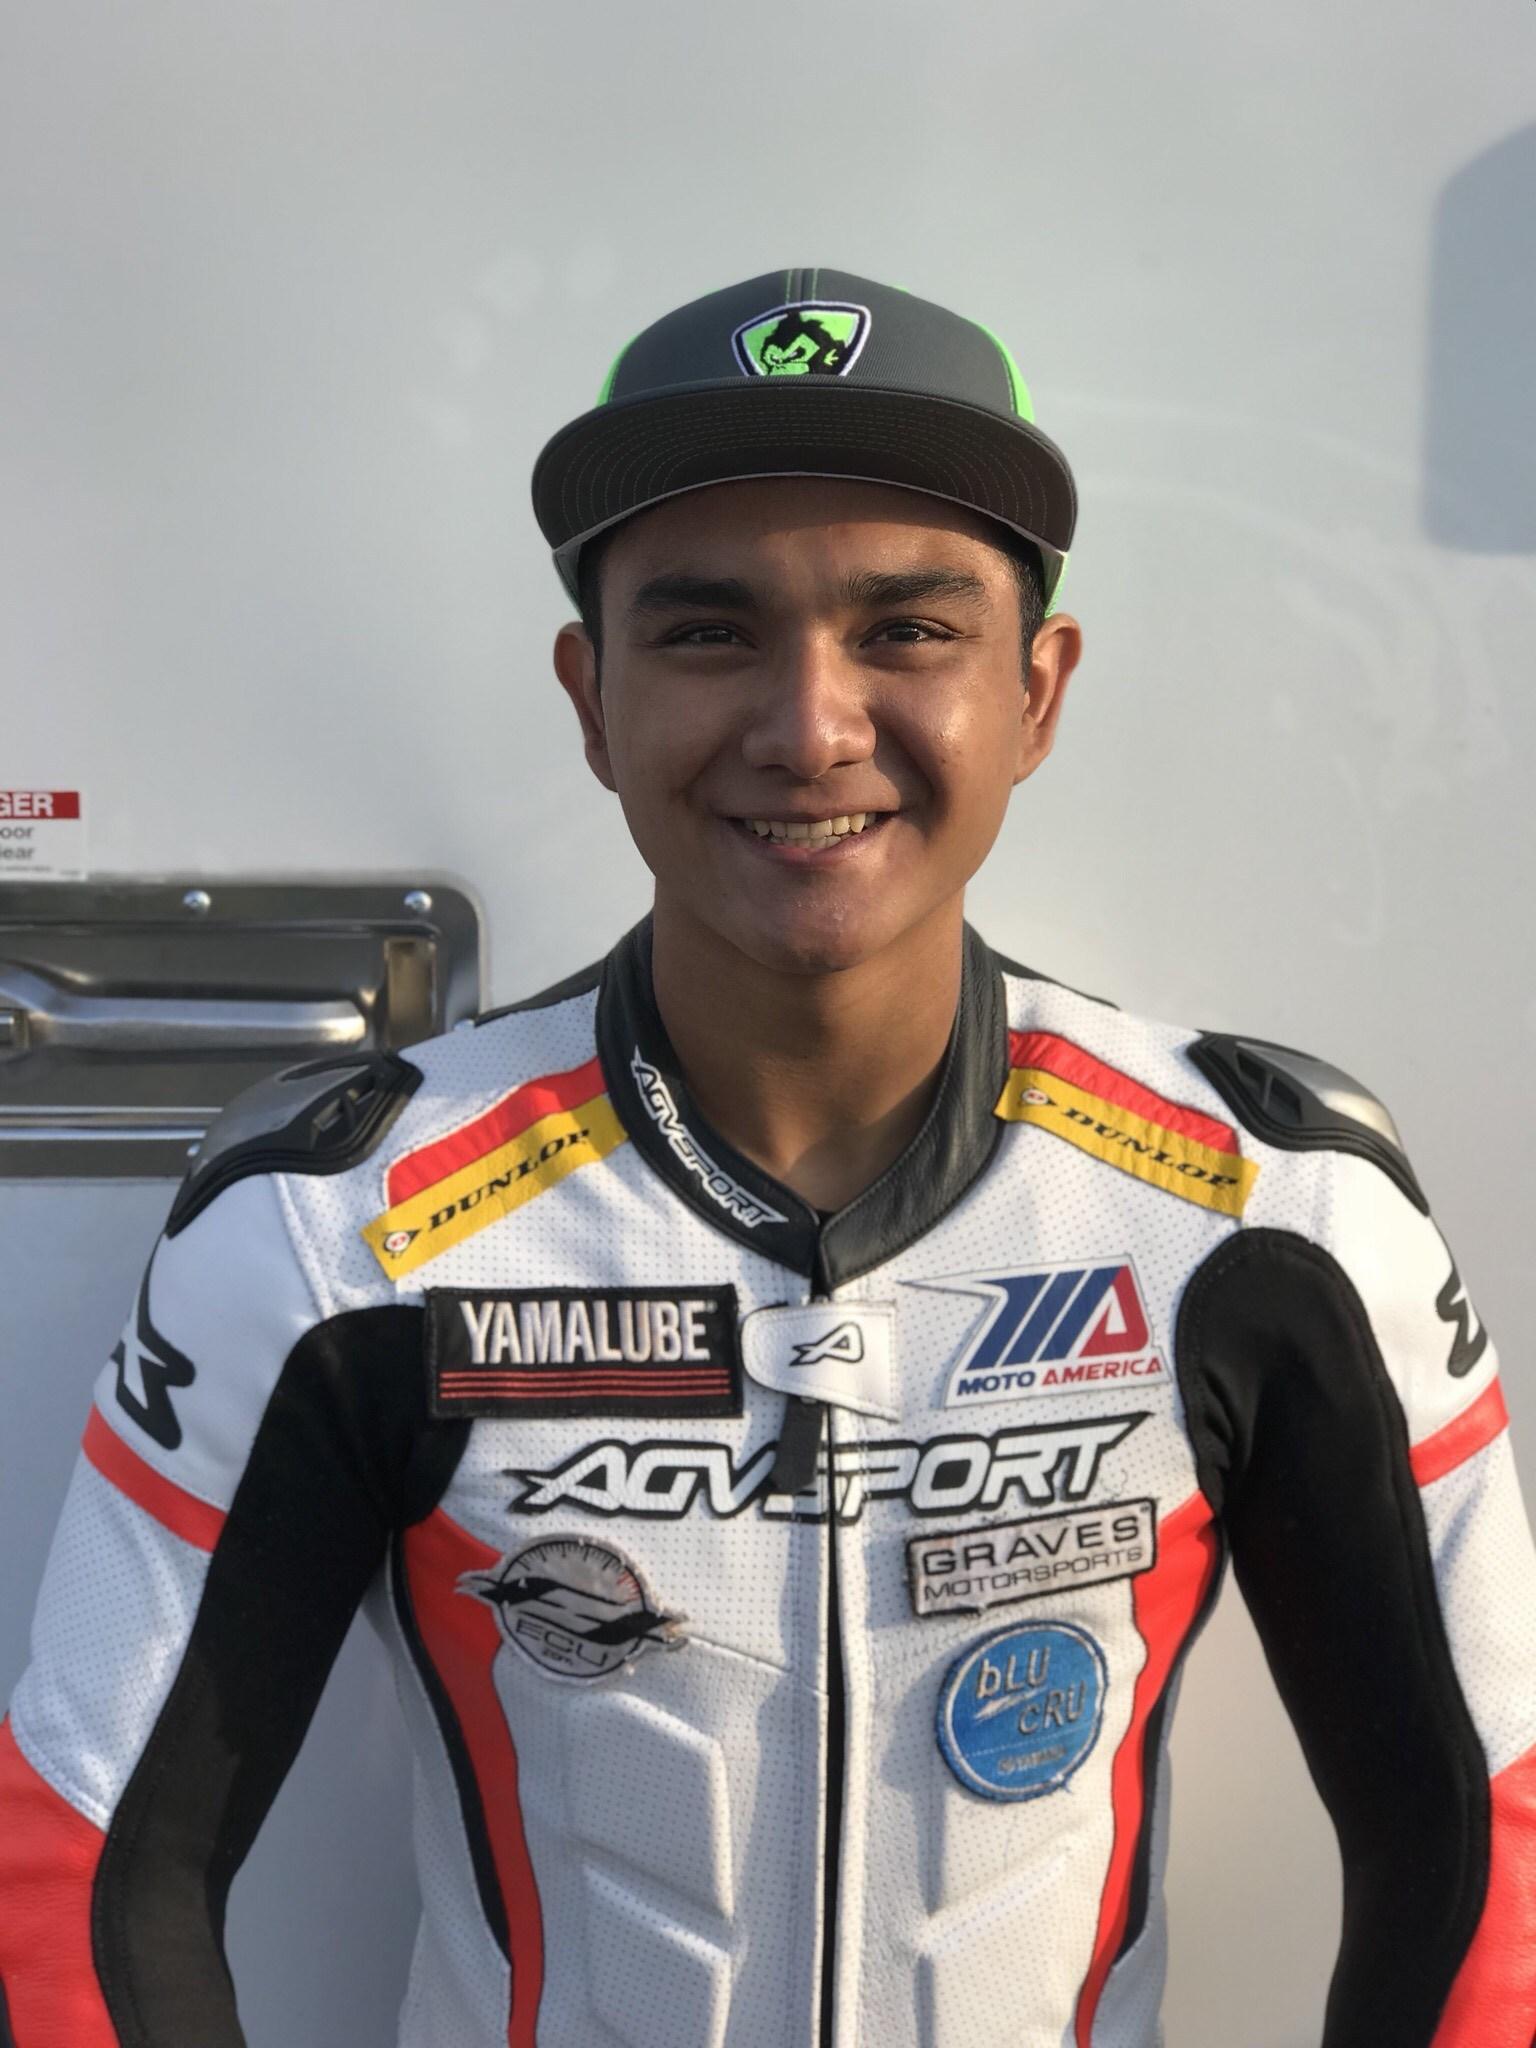 New rider Kevin Olmedo for MonkeyMoto at MotoAmerica race at Virginia International Raceway